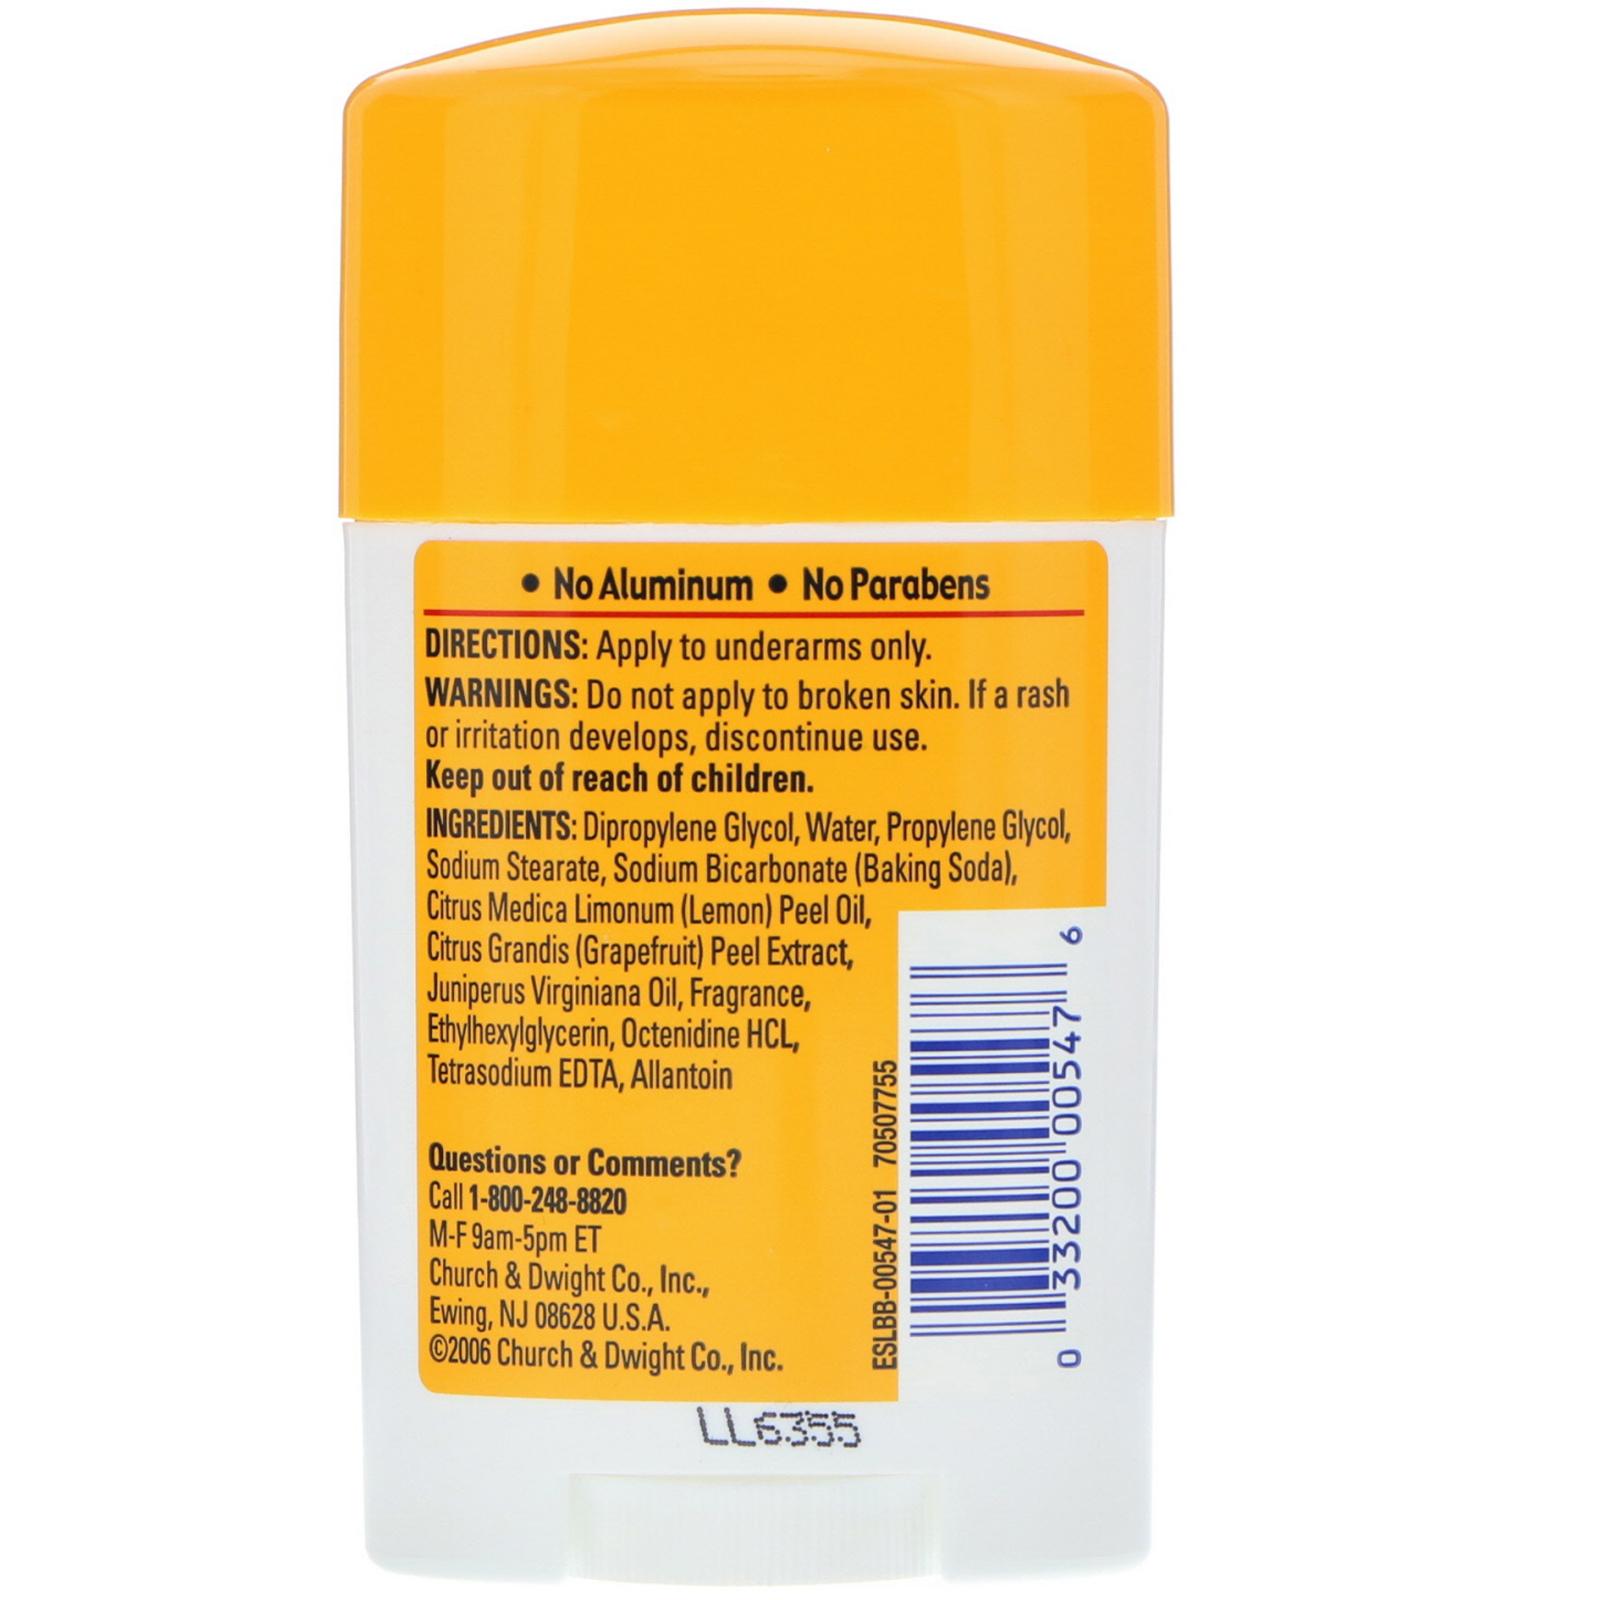 Arm & Hammer, Essentials Natural Deodorant, For Men and Women, Clean, 1 0  oz (28 g)